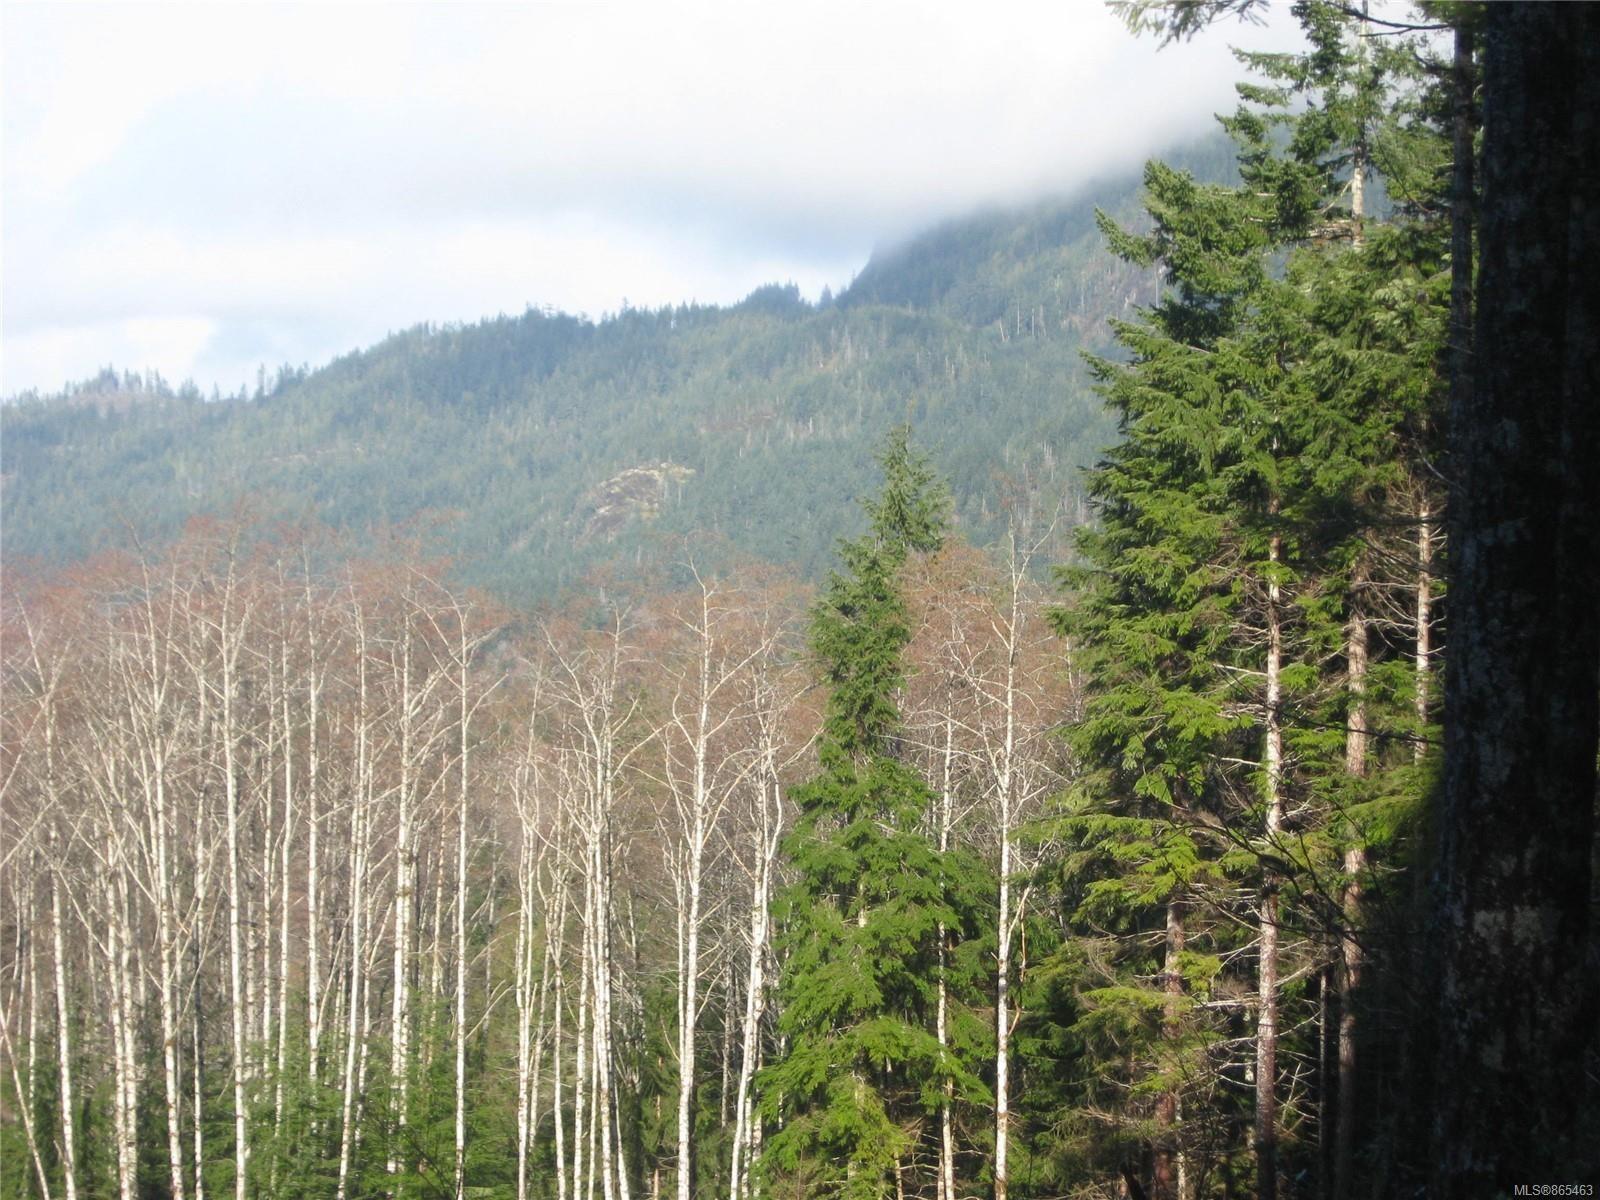 Photo 8: Photos: 1230 Cottonwood Rd in : NI Kelsey Bay/Sayward Land for sale (North Island)  : MLS®# 865463